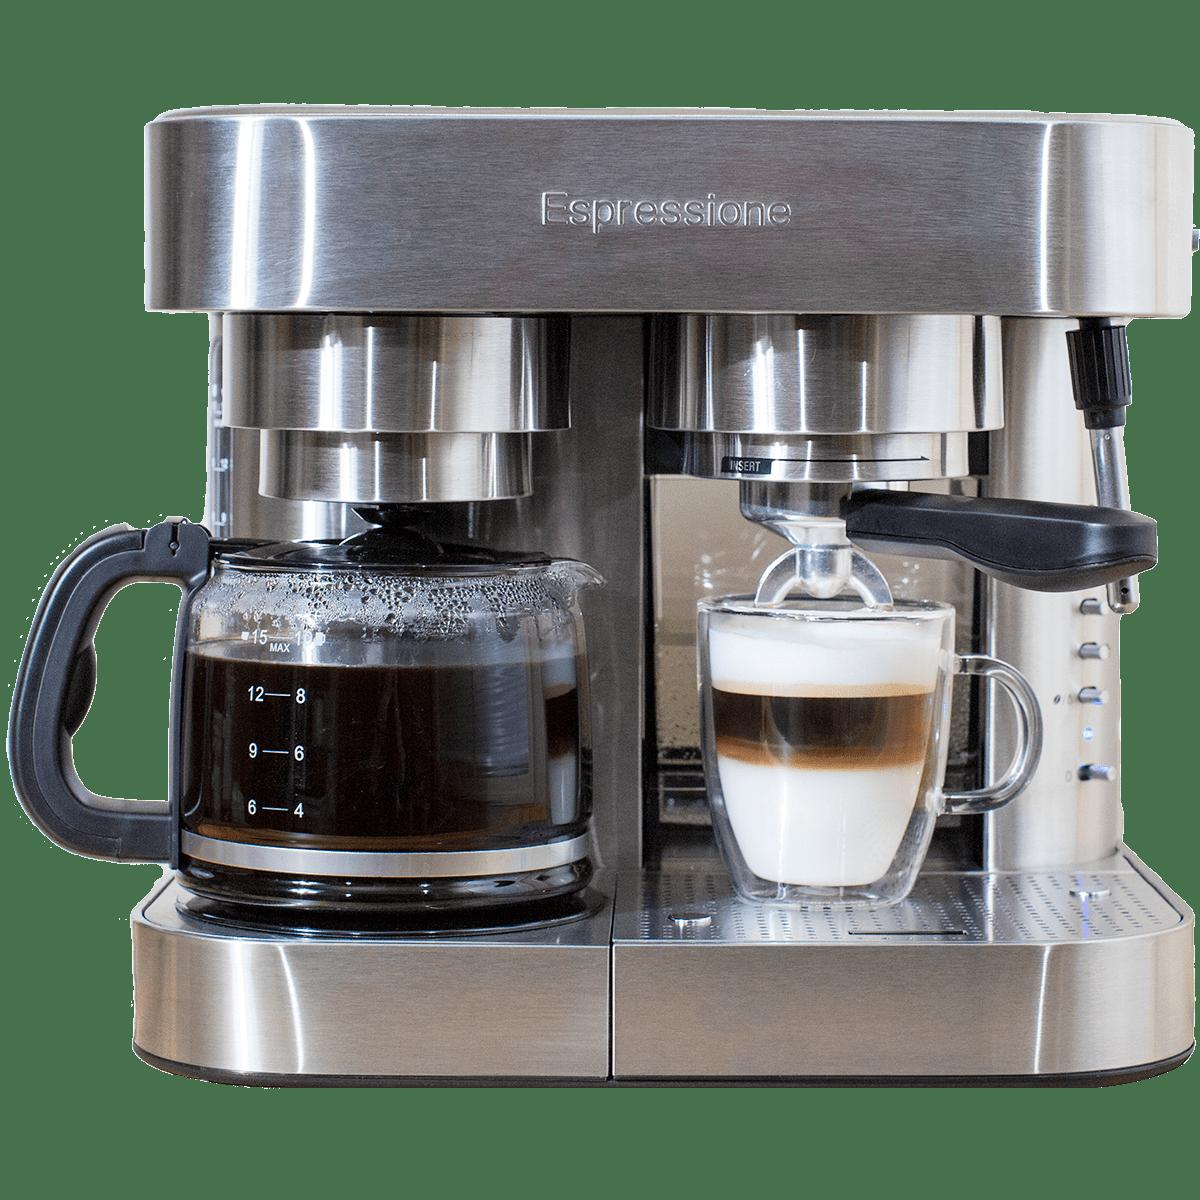 Espressione EM-1040 Espresso Machine & Drip Coffeemaker ...